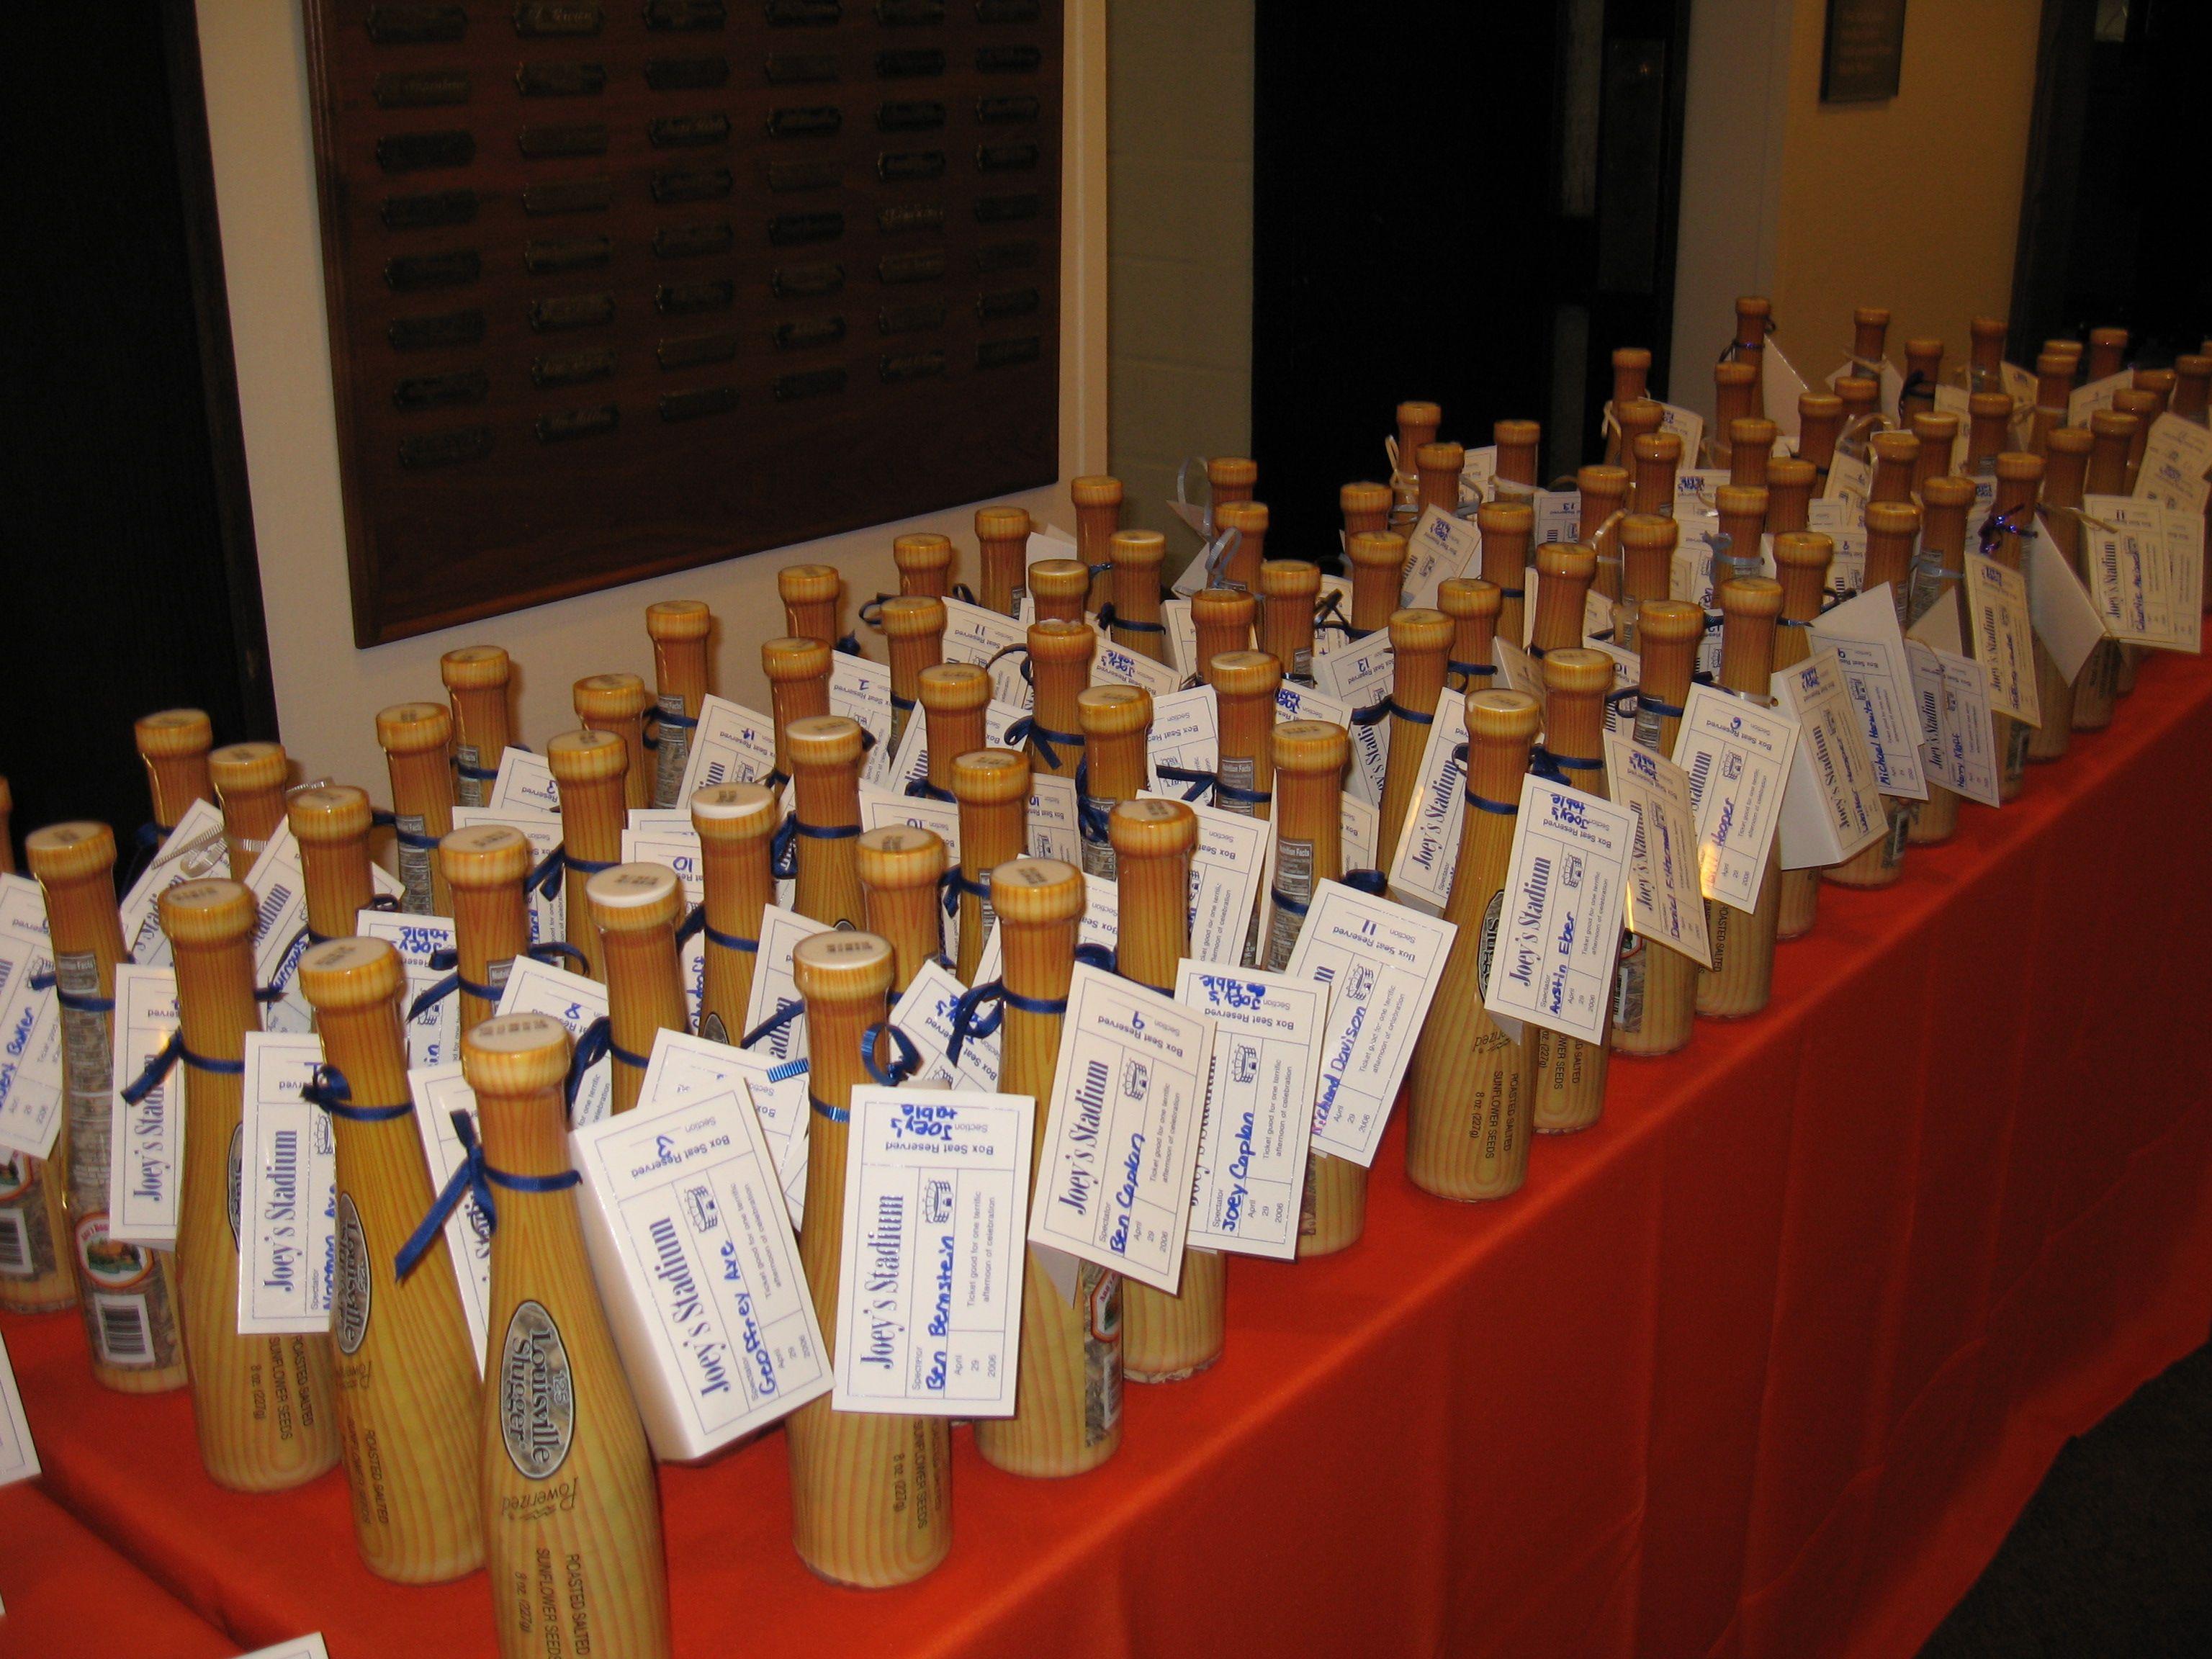 baseball bar mitzvah invitations - Google Search | Sports Bar ...